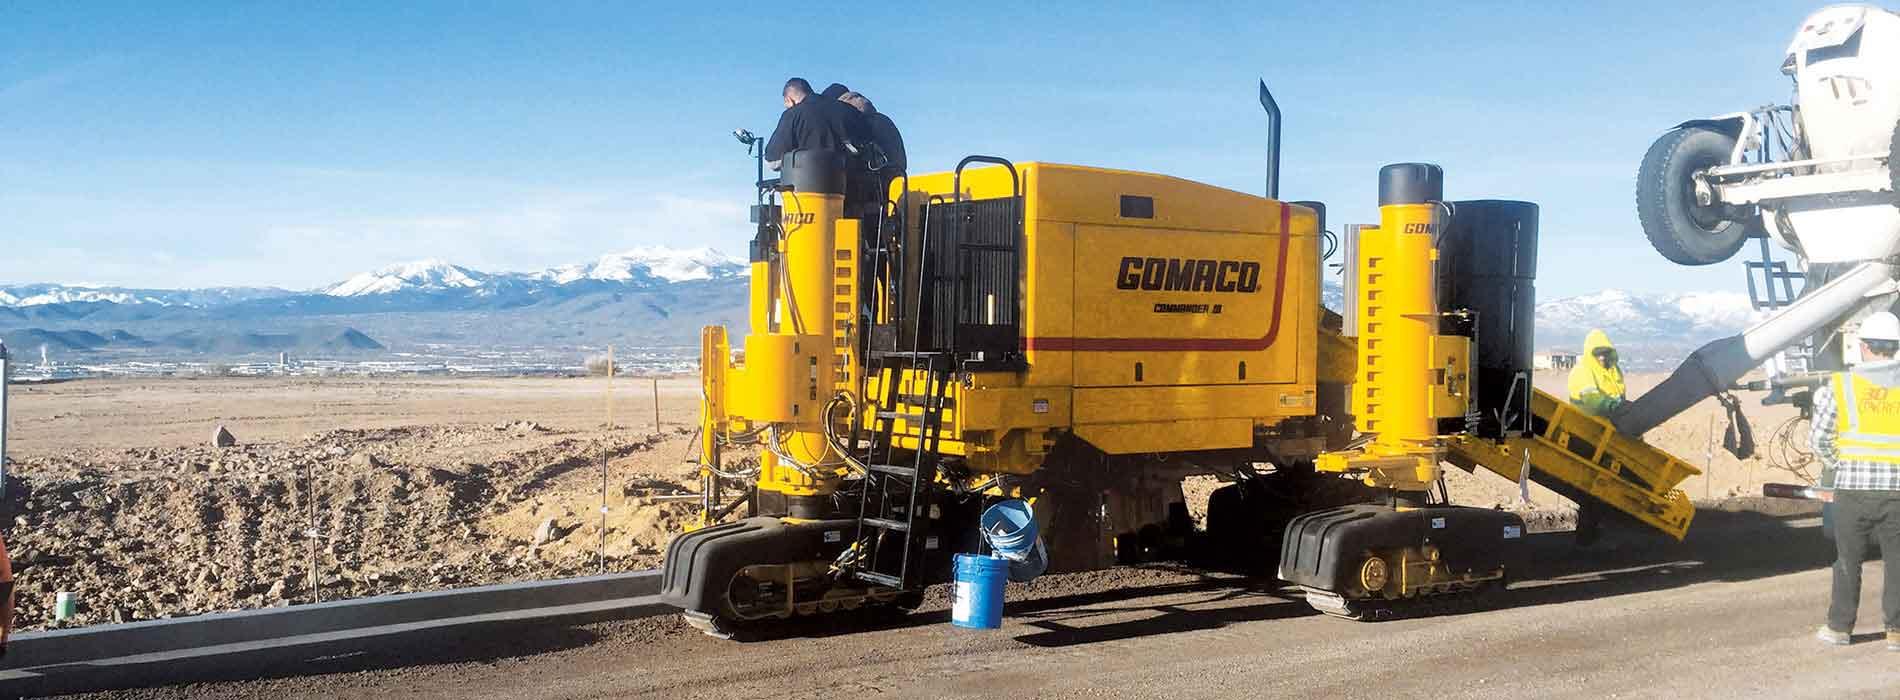 Gomaco Manufacturer Of Concrete Slipform Paving Equipment Next Generation Three Track Commander Iii